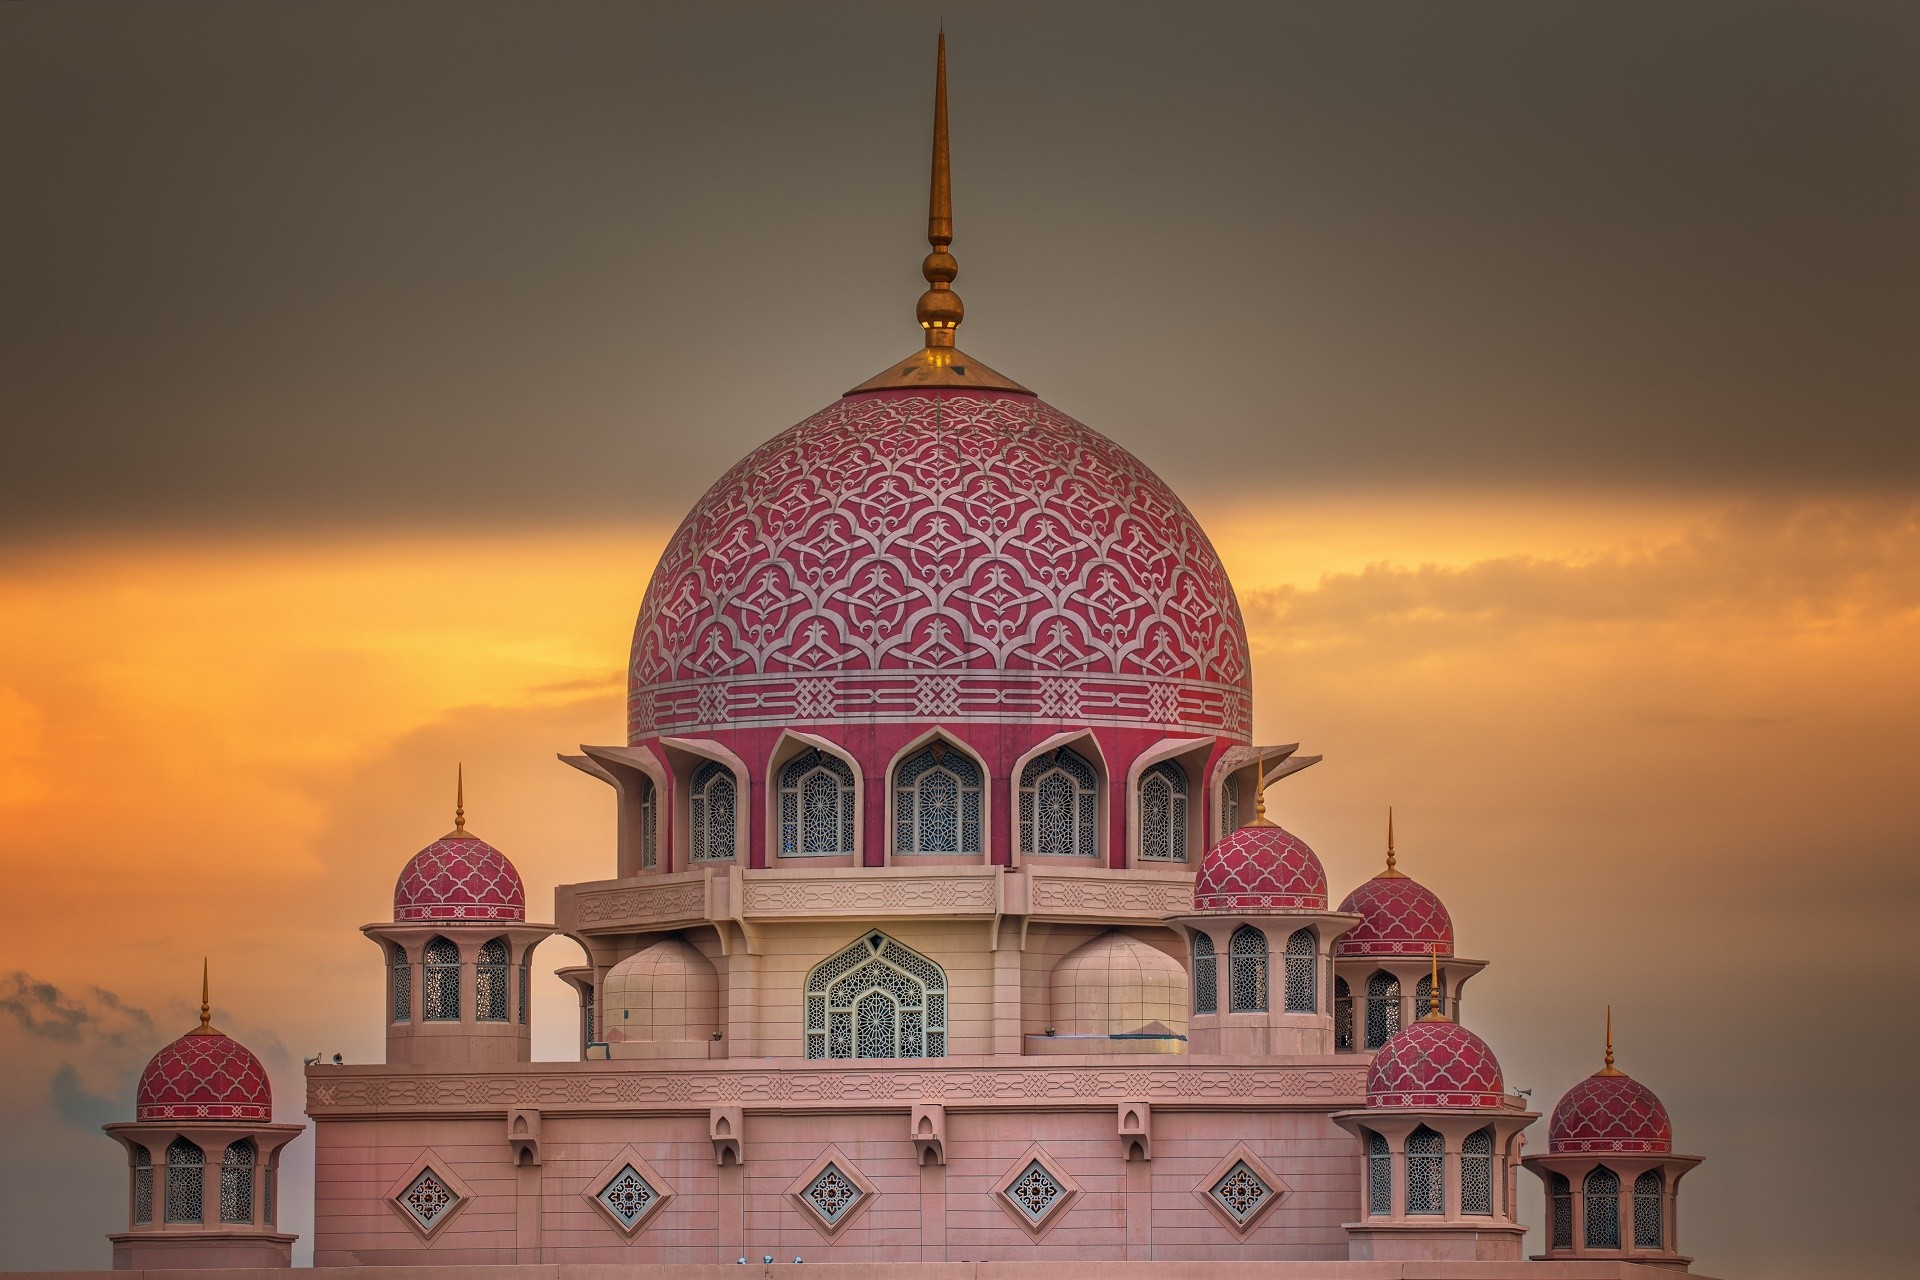 Masjid Wallpaper (58+ Images